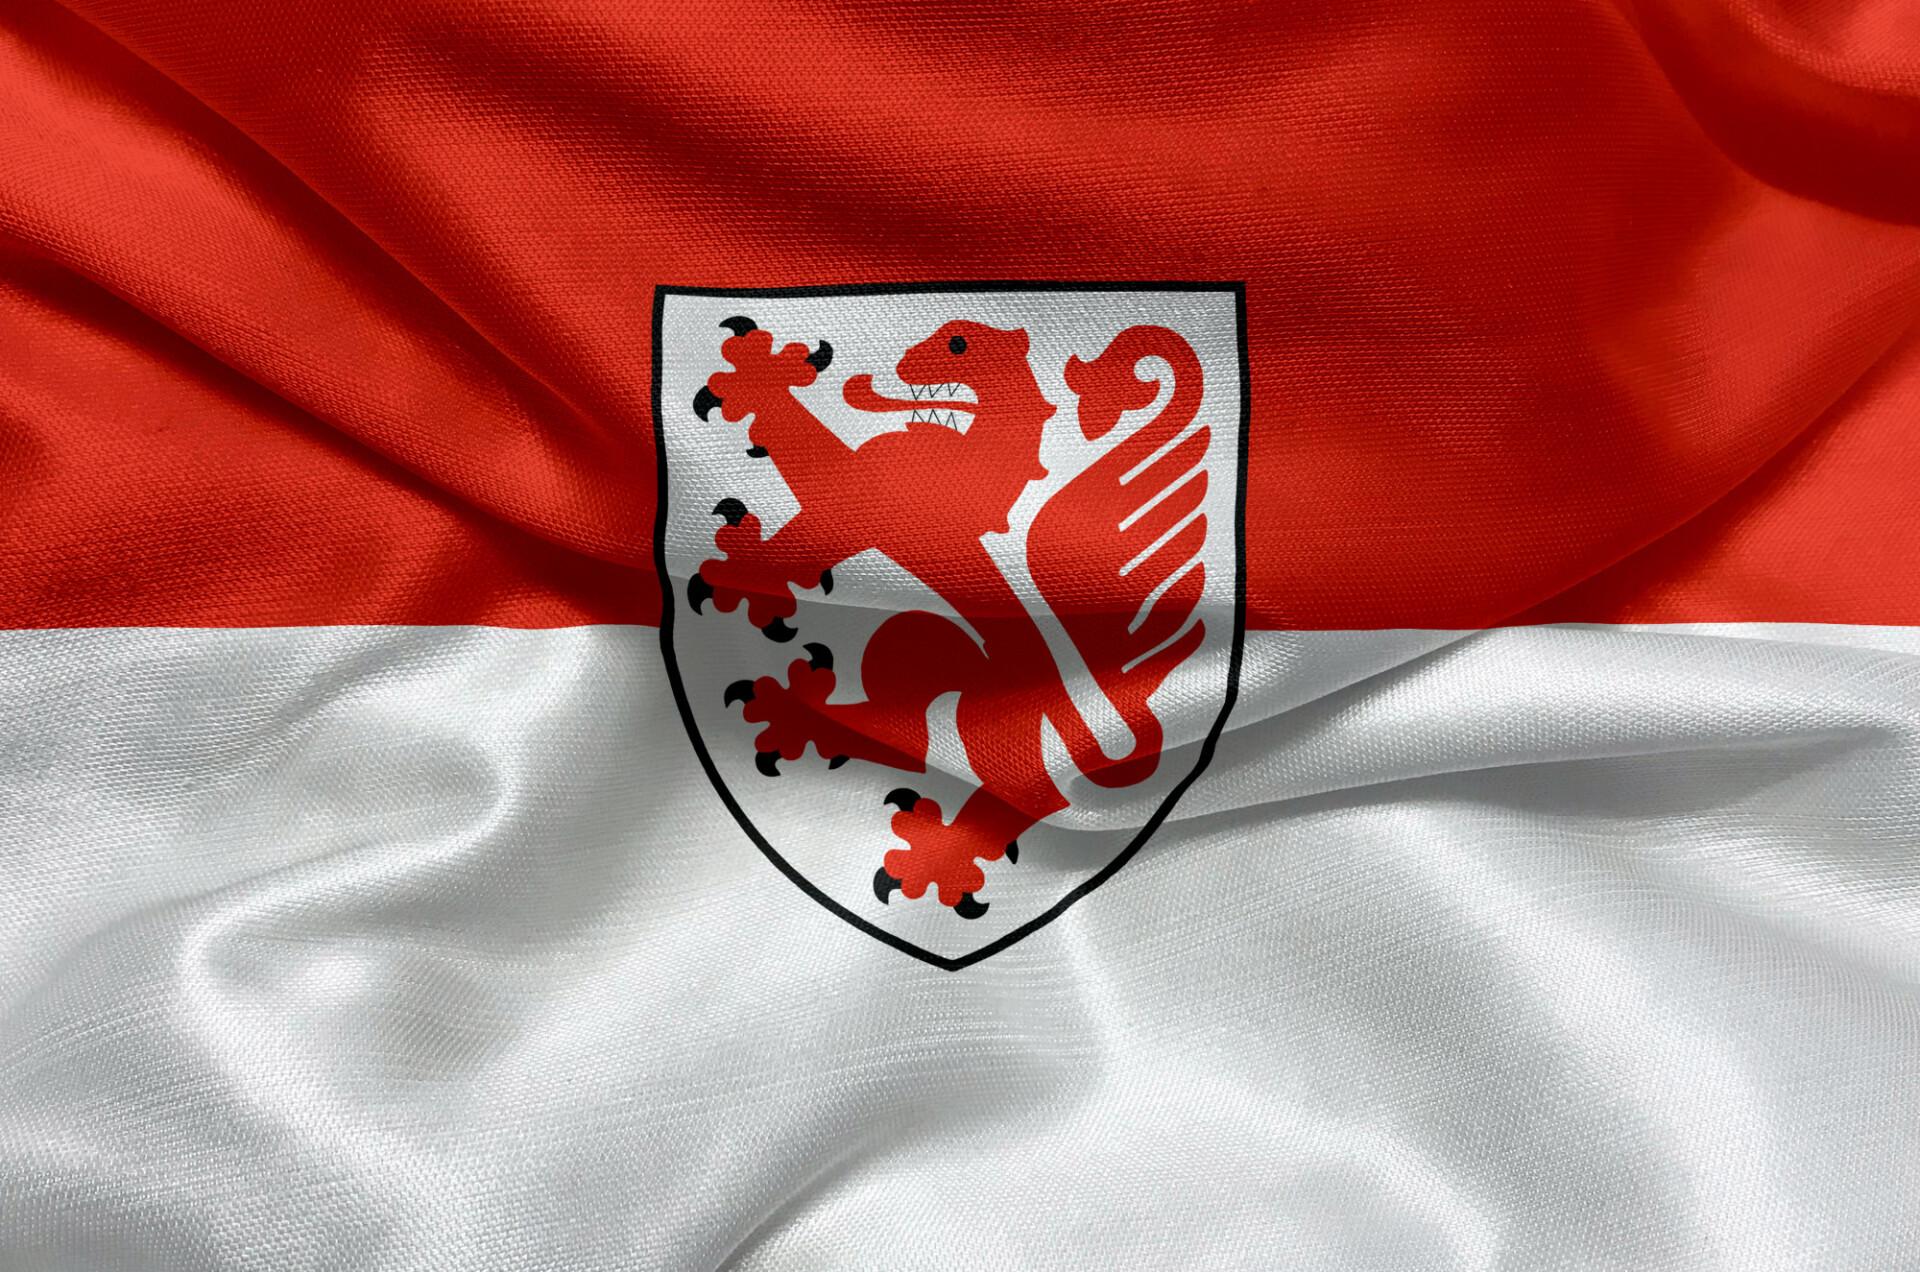 Flag of the city of Braunschweig